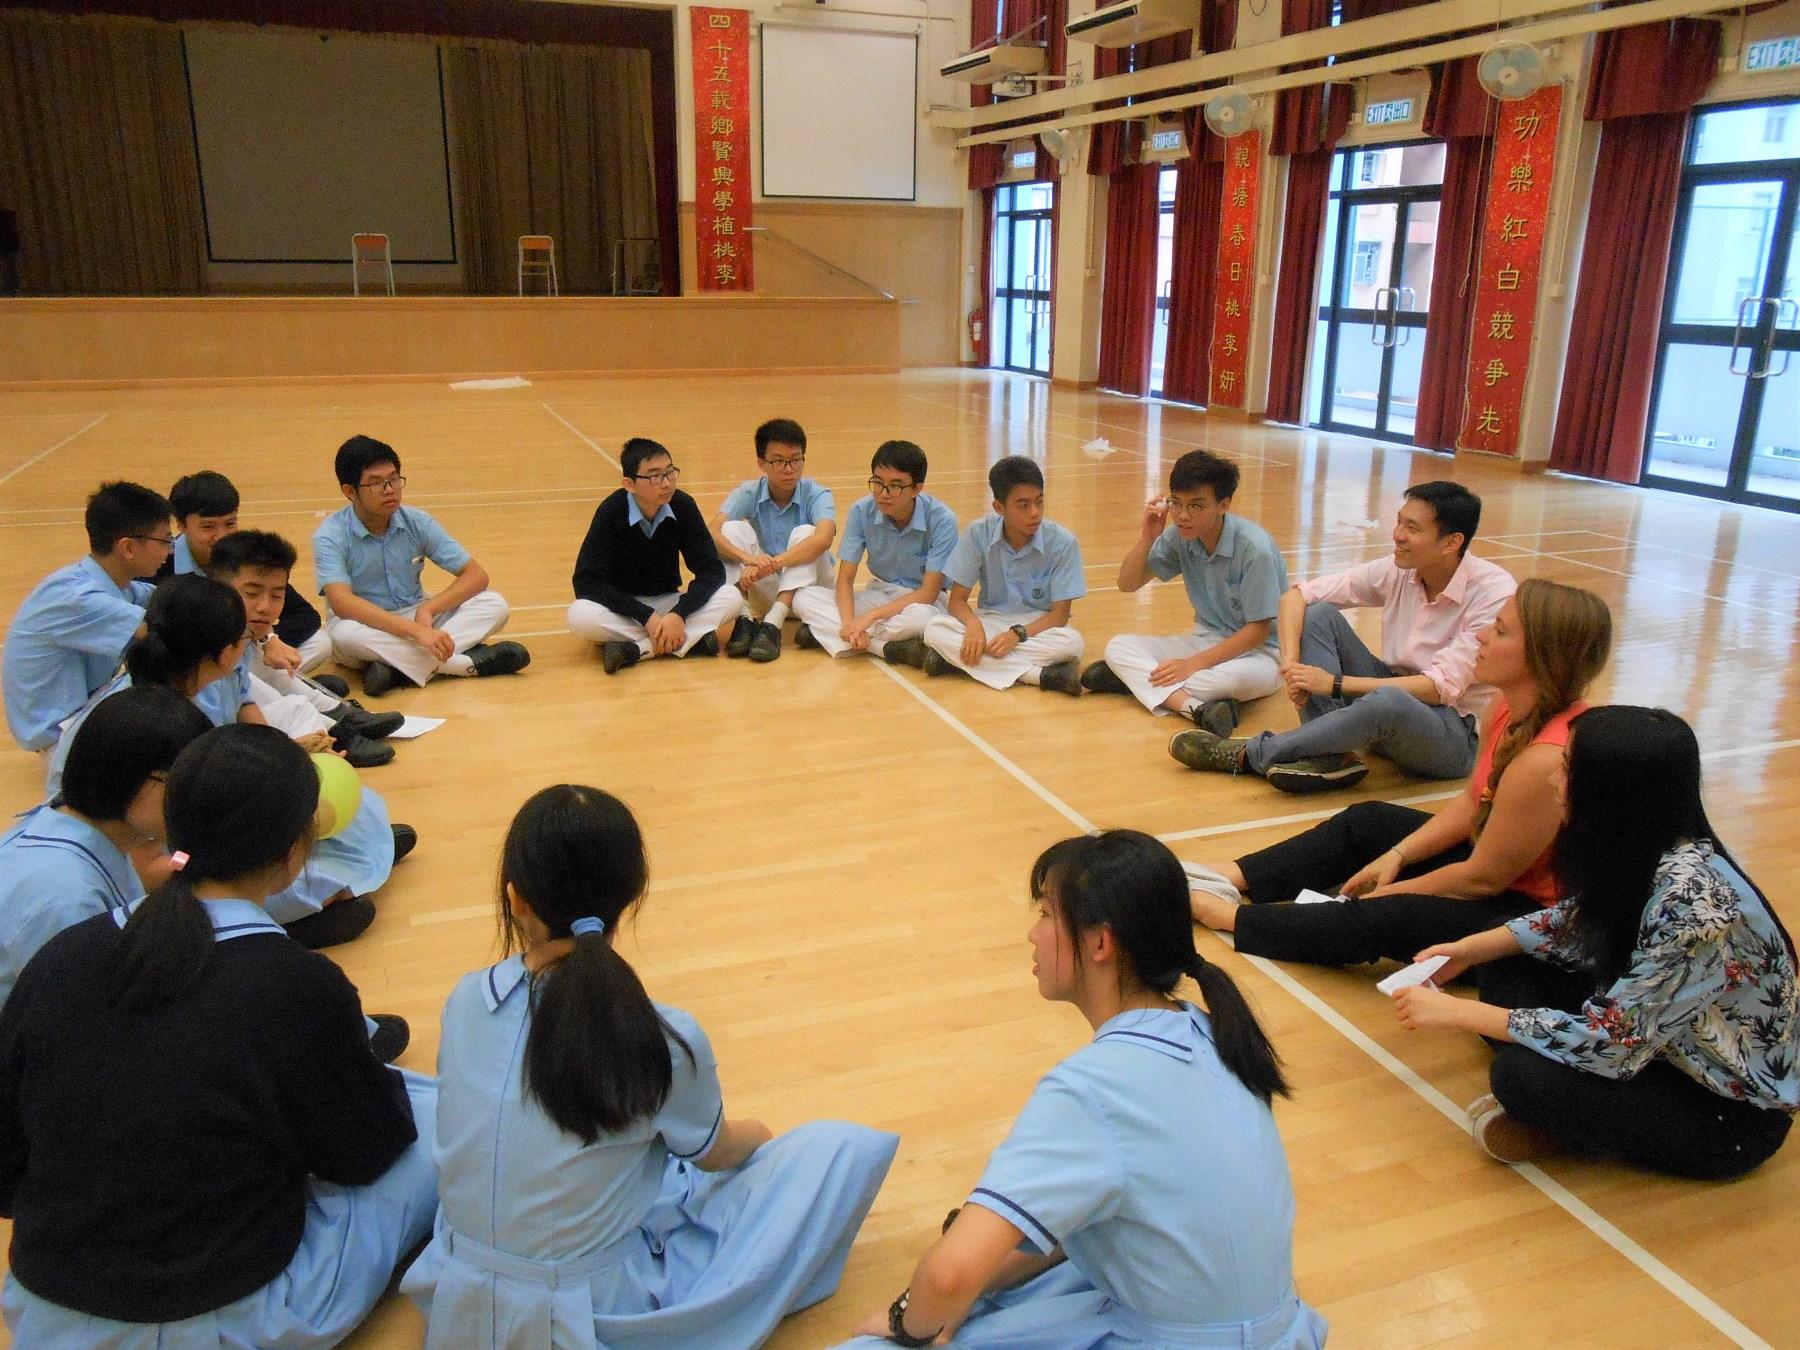 http://npc.edu.hk/sites/default/files/dscn0154.jpg